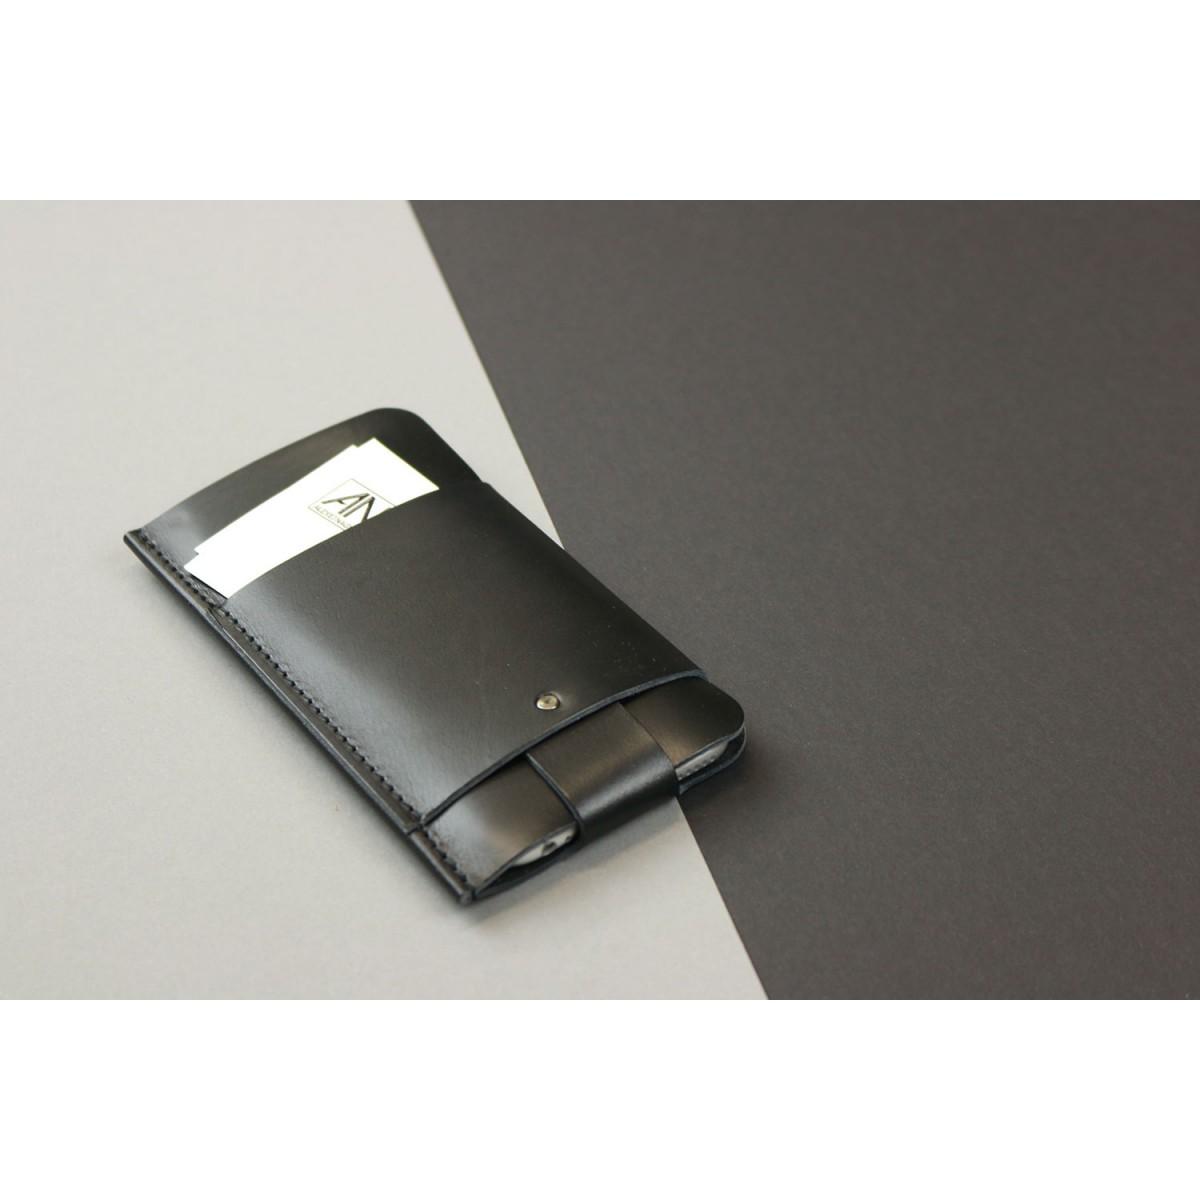 Alexej Nagel iPhone 5/5S/SE Slim Fit Hülle aus Premium Leder - schwarz [BL]